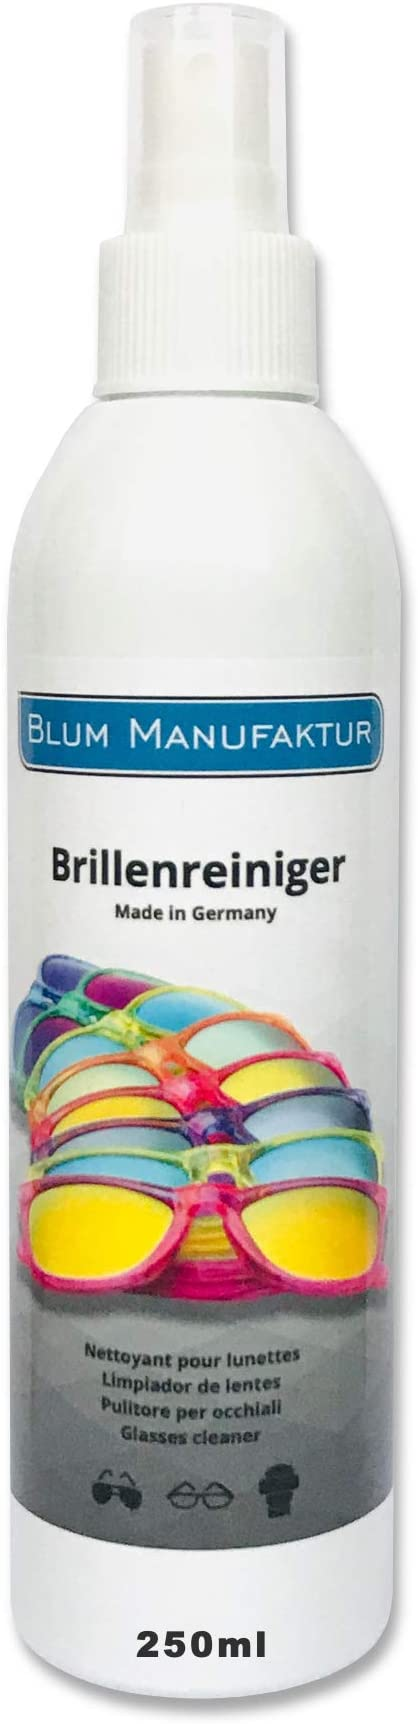 143 opinioni per Blum – 250 ml detergente spray per occhiali – Pulizia senza strisce di tutti gli